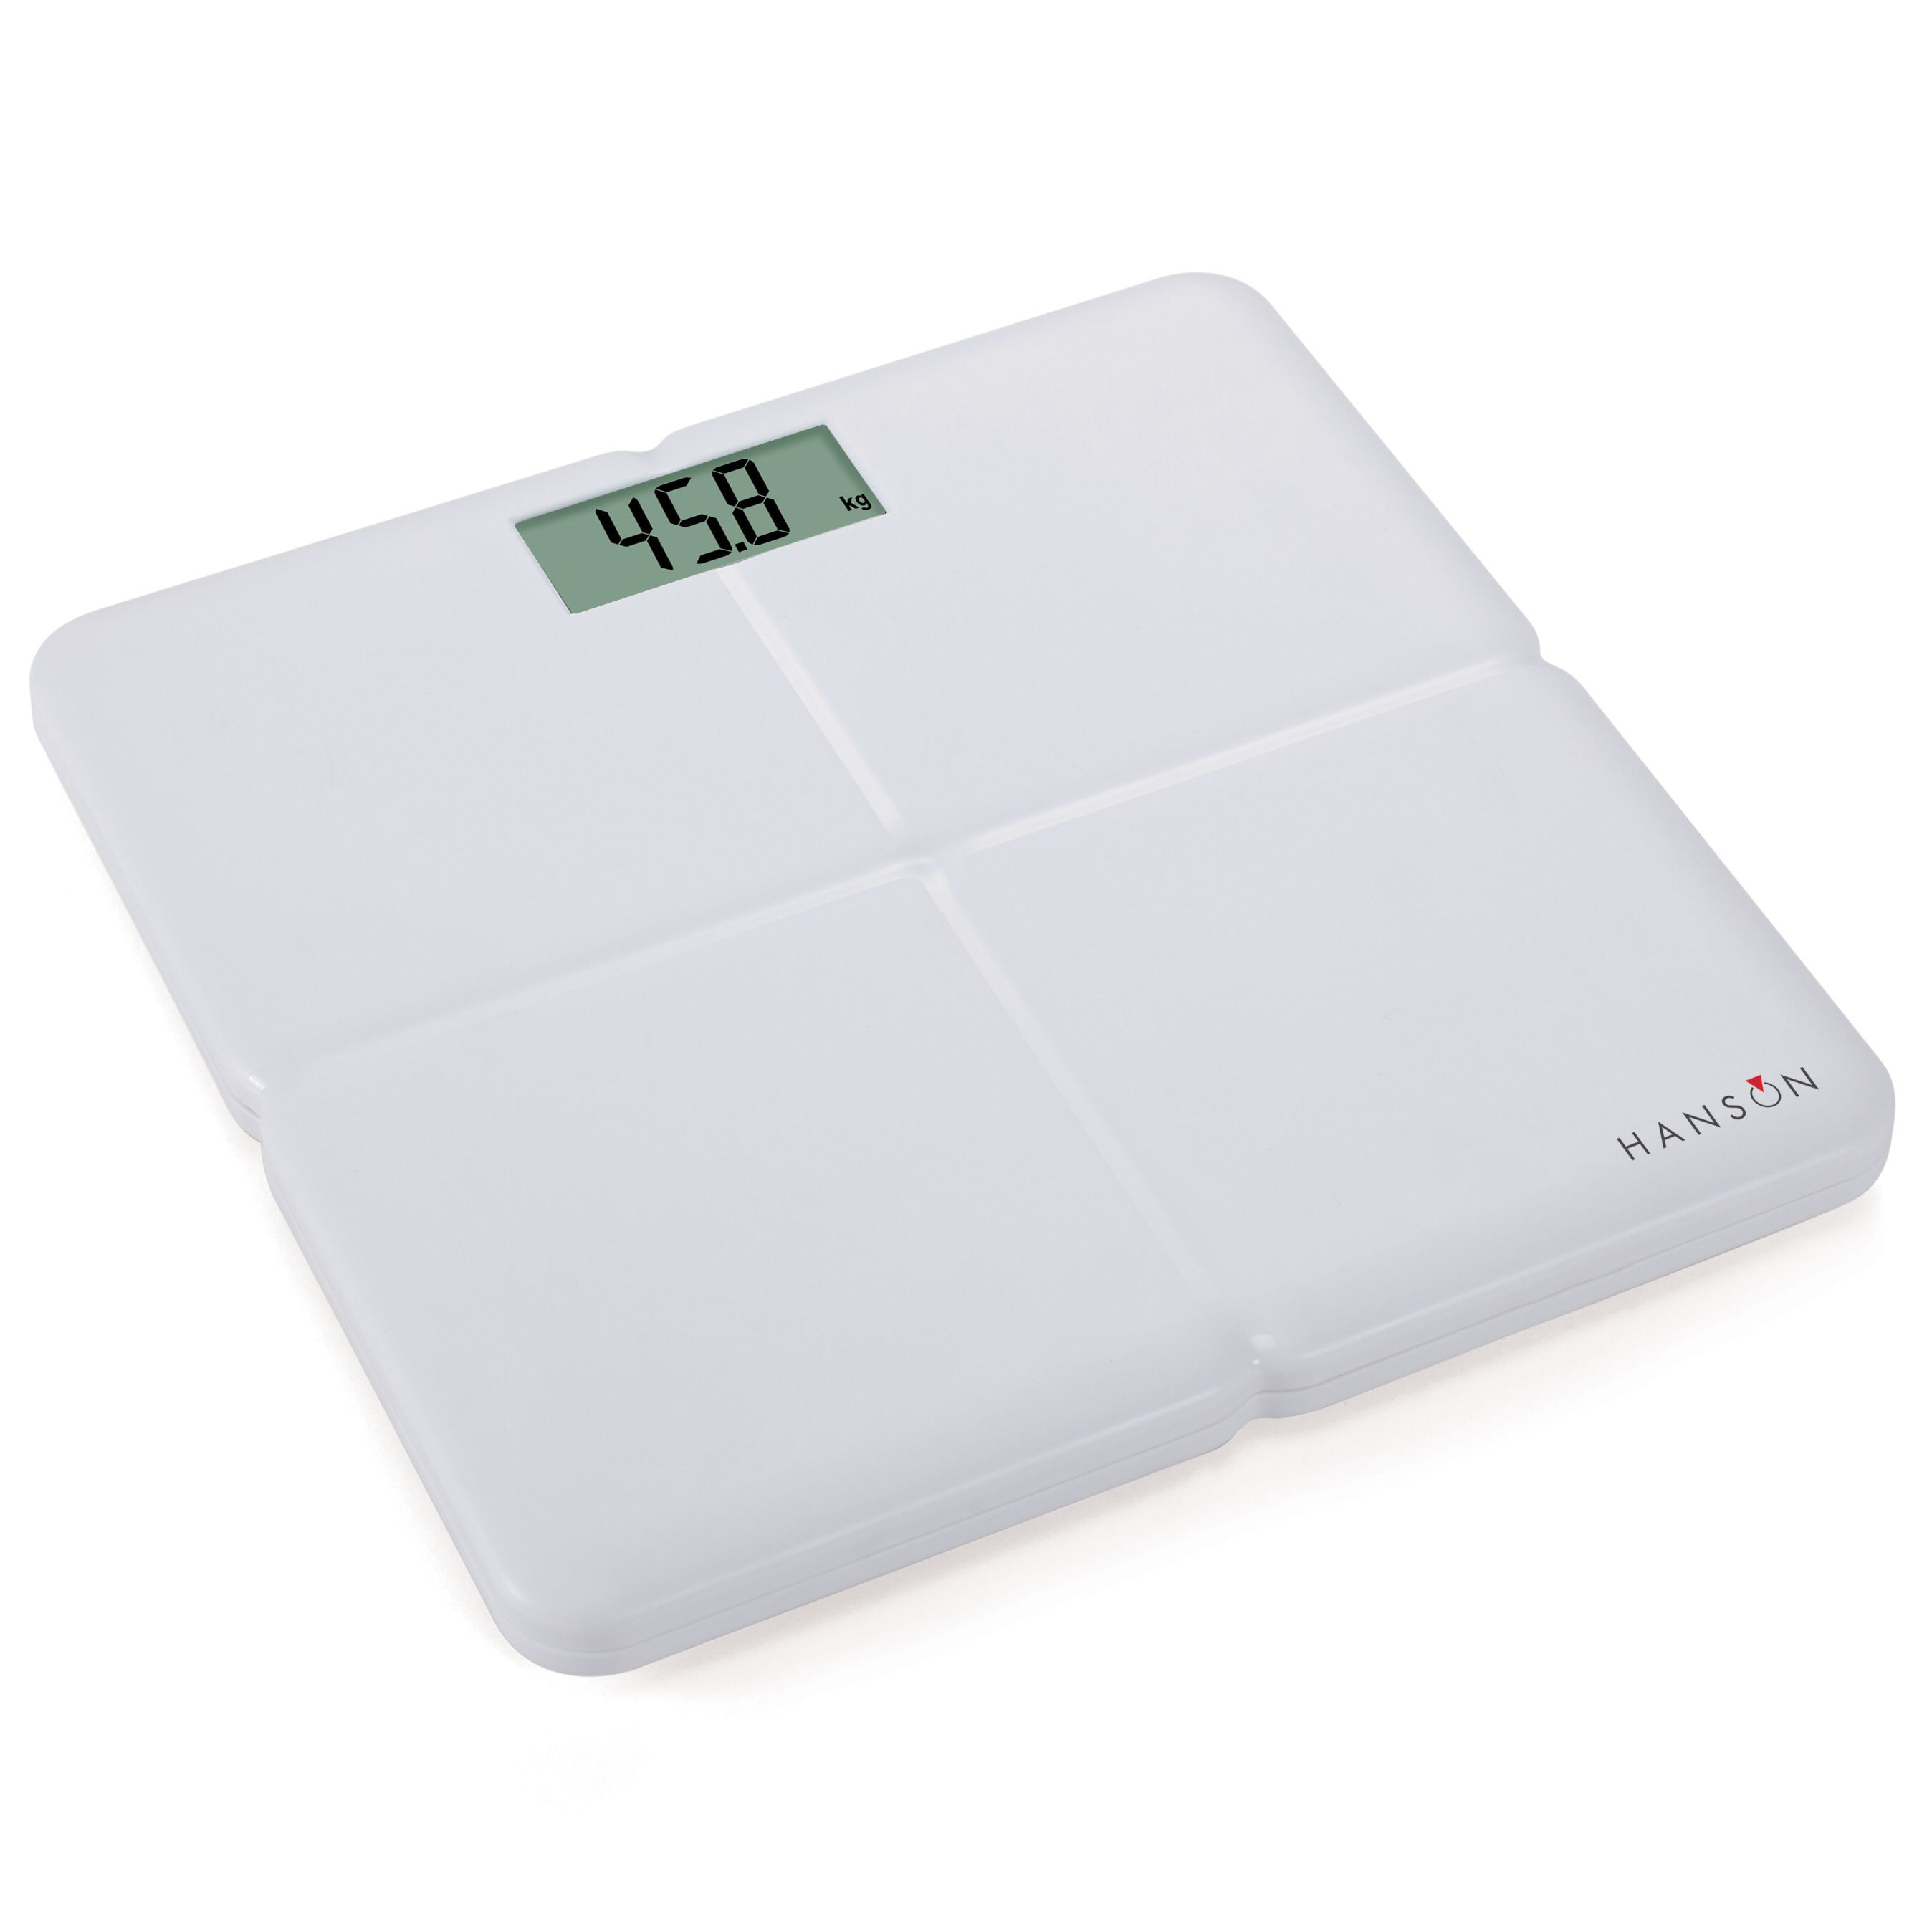 B q bathroom scales - Hanson White Slim Bathroom Scale